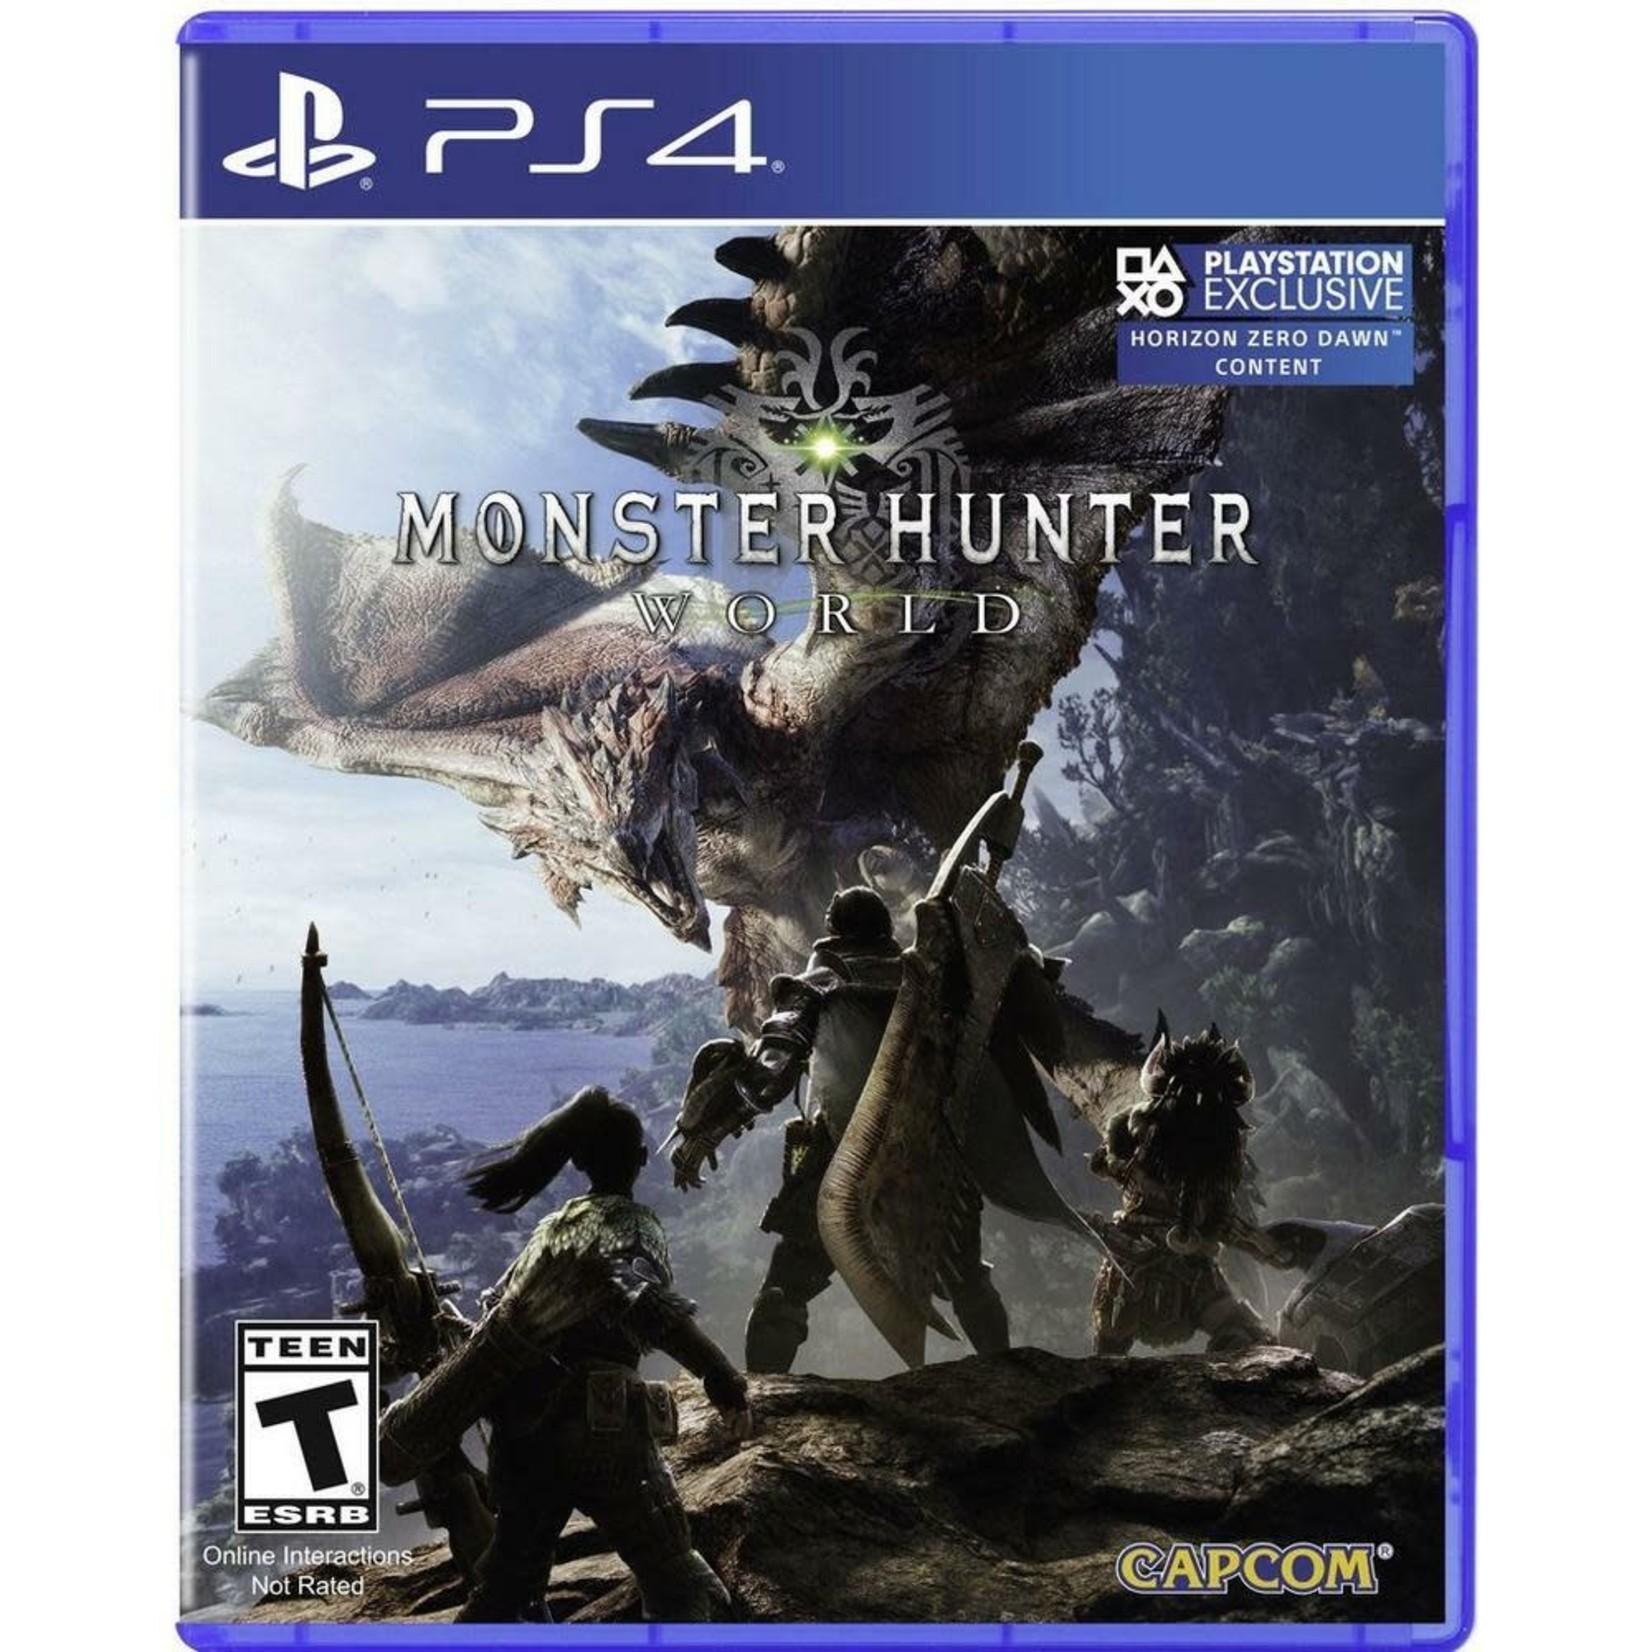 PS4U-MONSTER HUNTER: WORLD